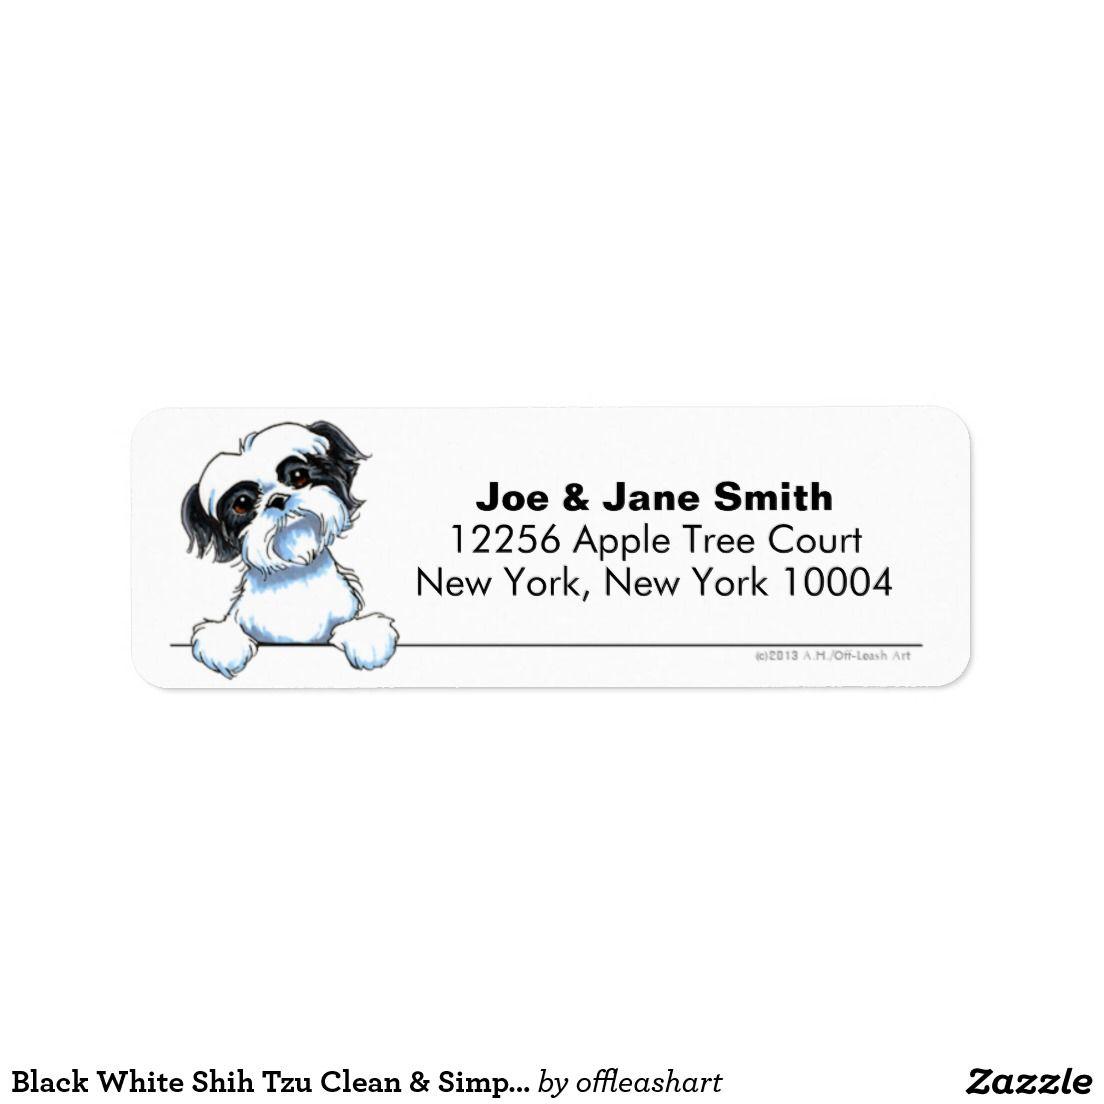 Black White Shih Tzu Clean Amp Simple Label